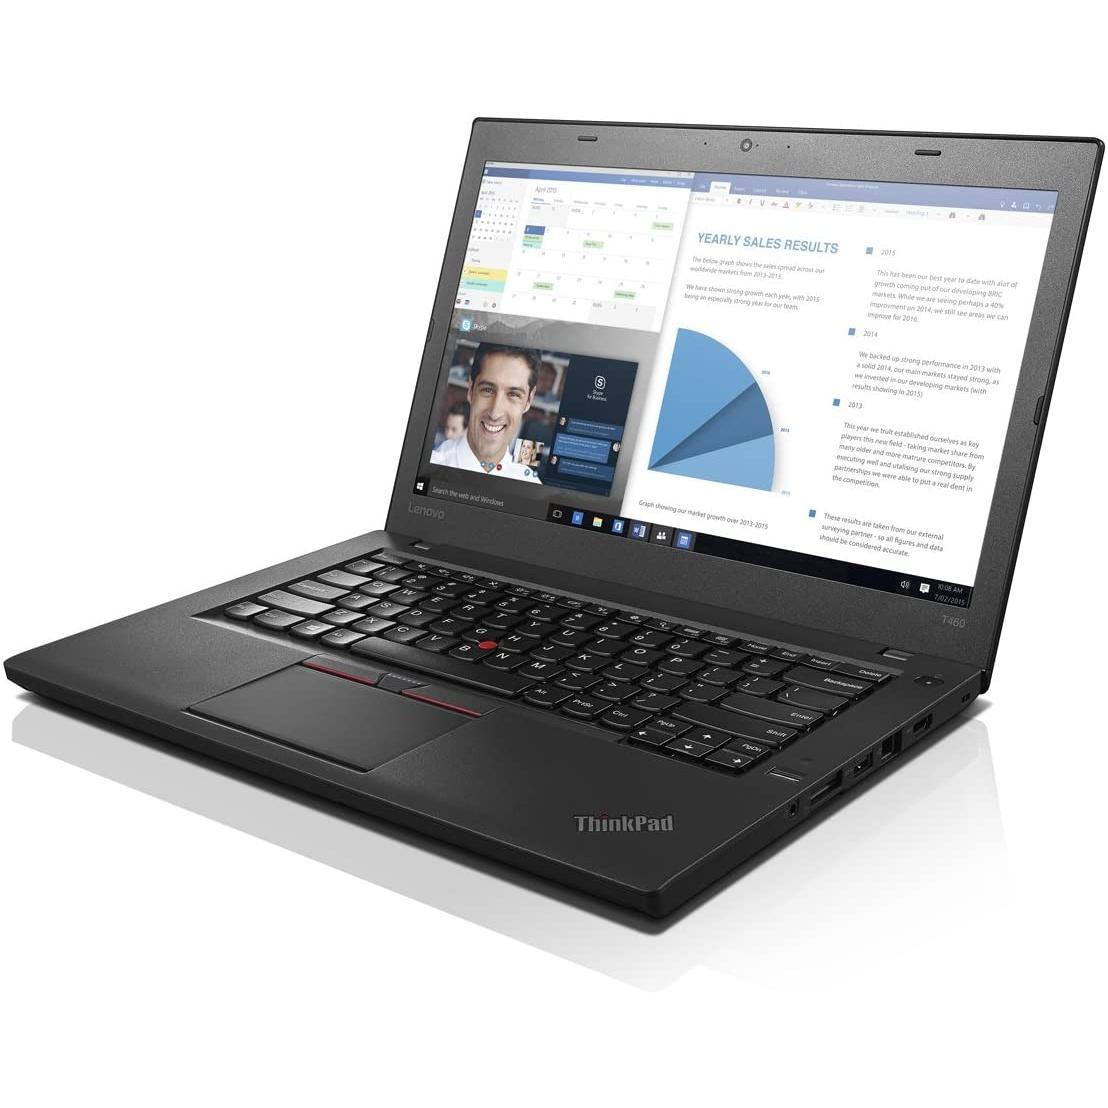 Lenovo ThinkPad T460 14-inch (2016) - Core i5-6300U - 8 GB - SSD 256 GB